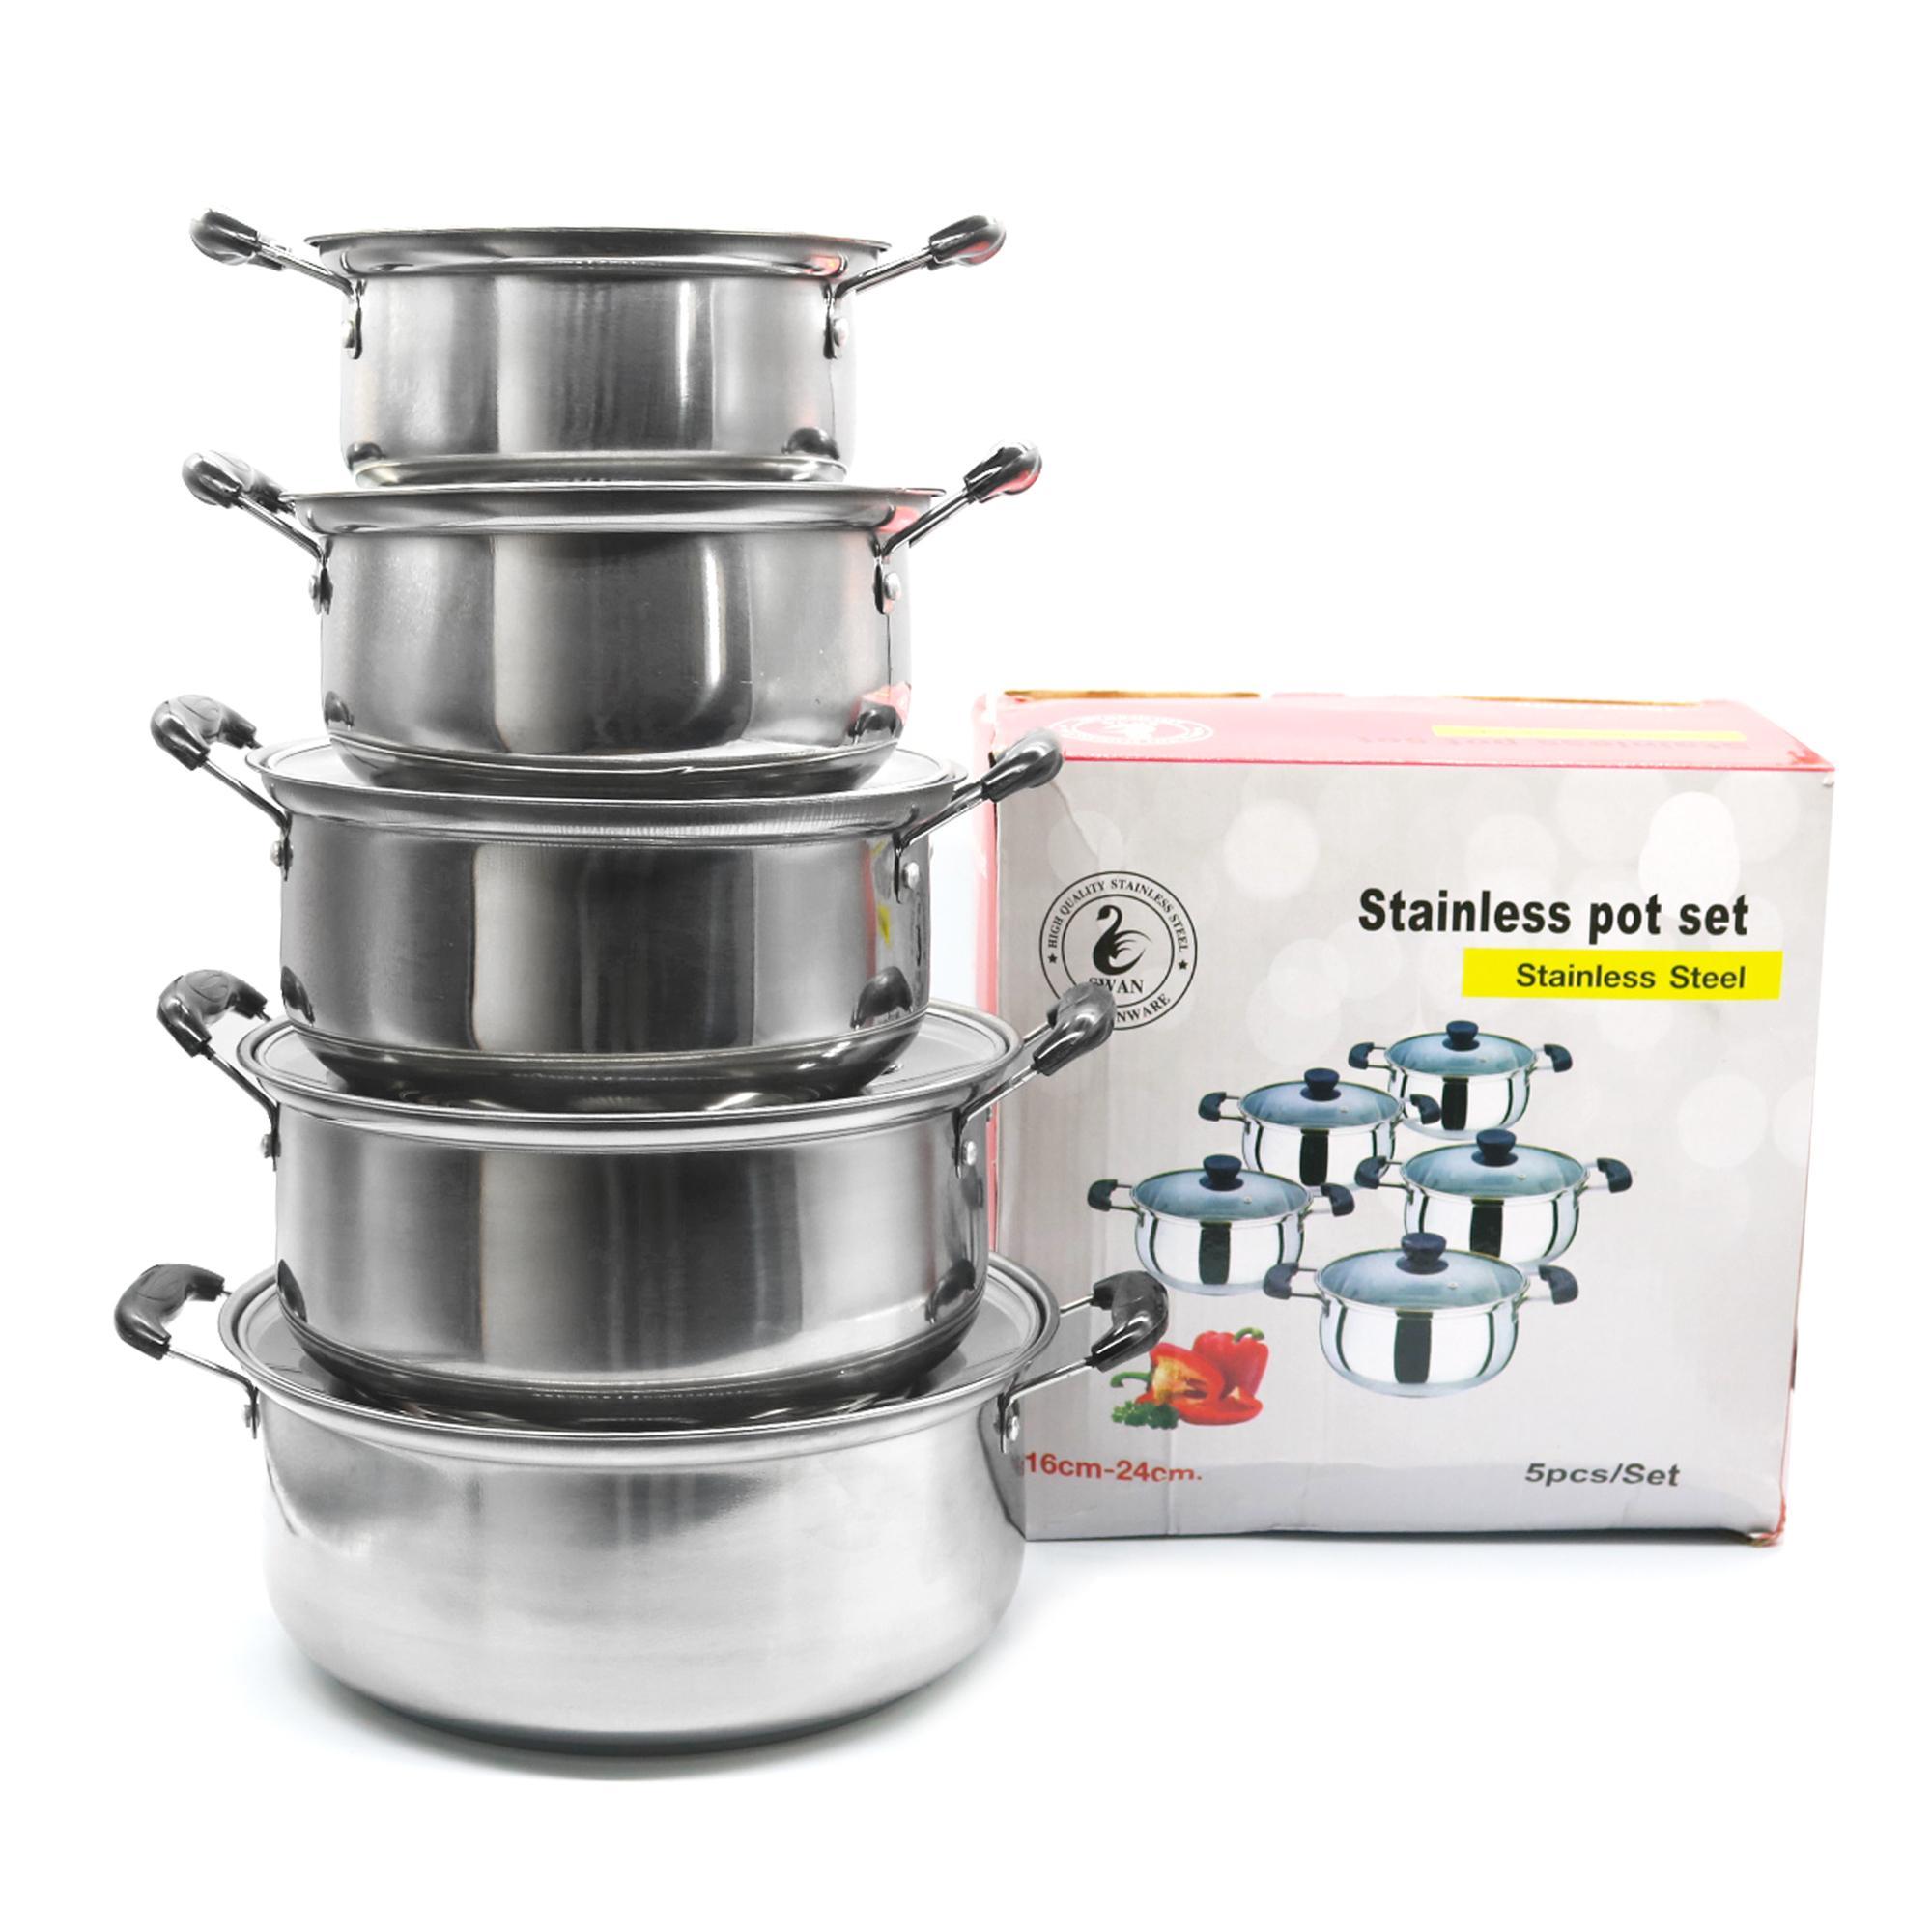 Stainless Pot Set 5pcs set